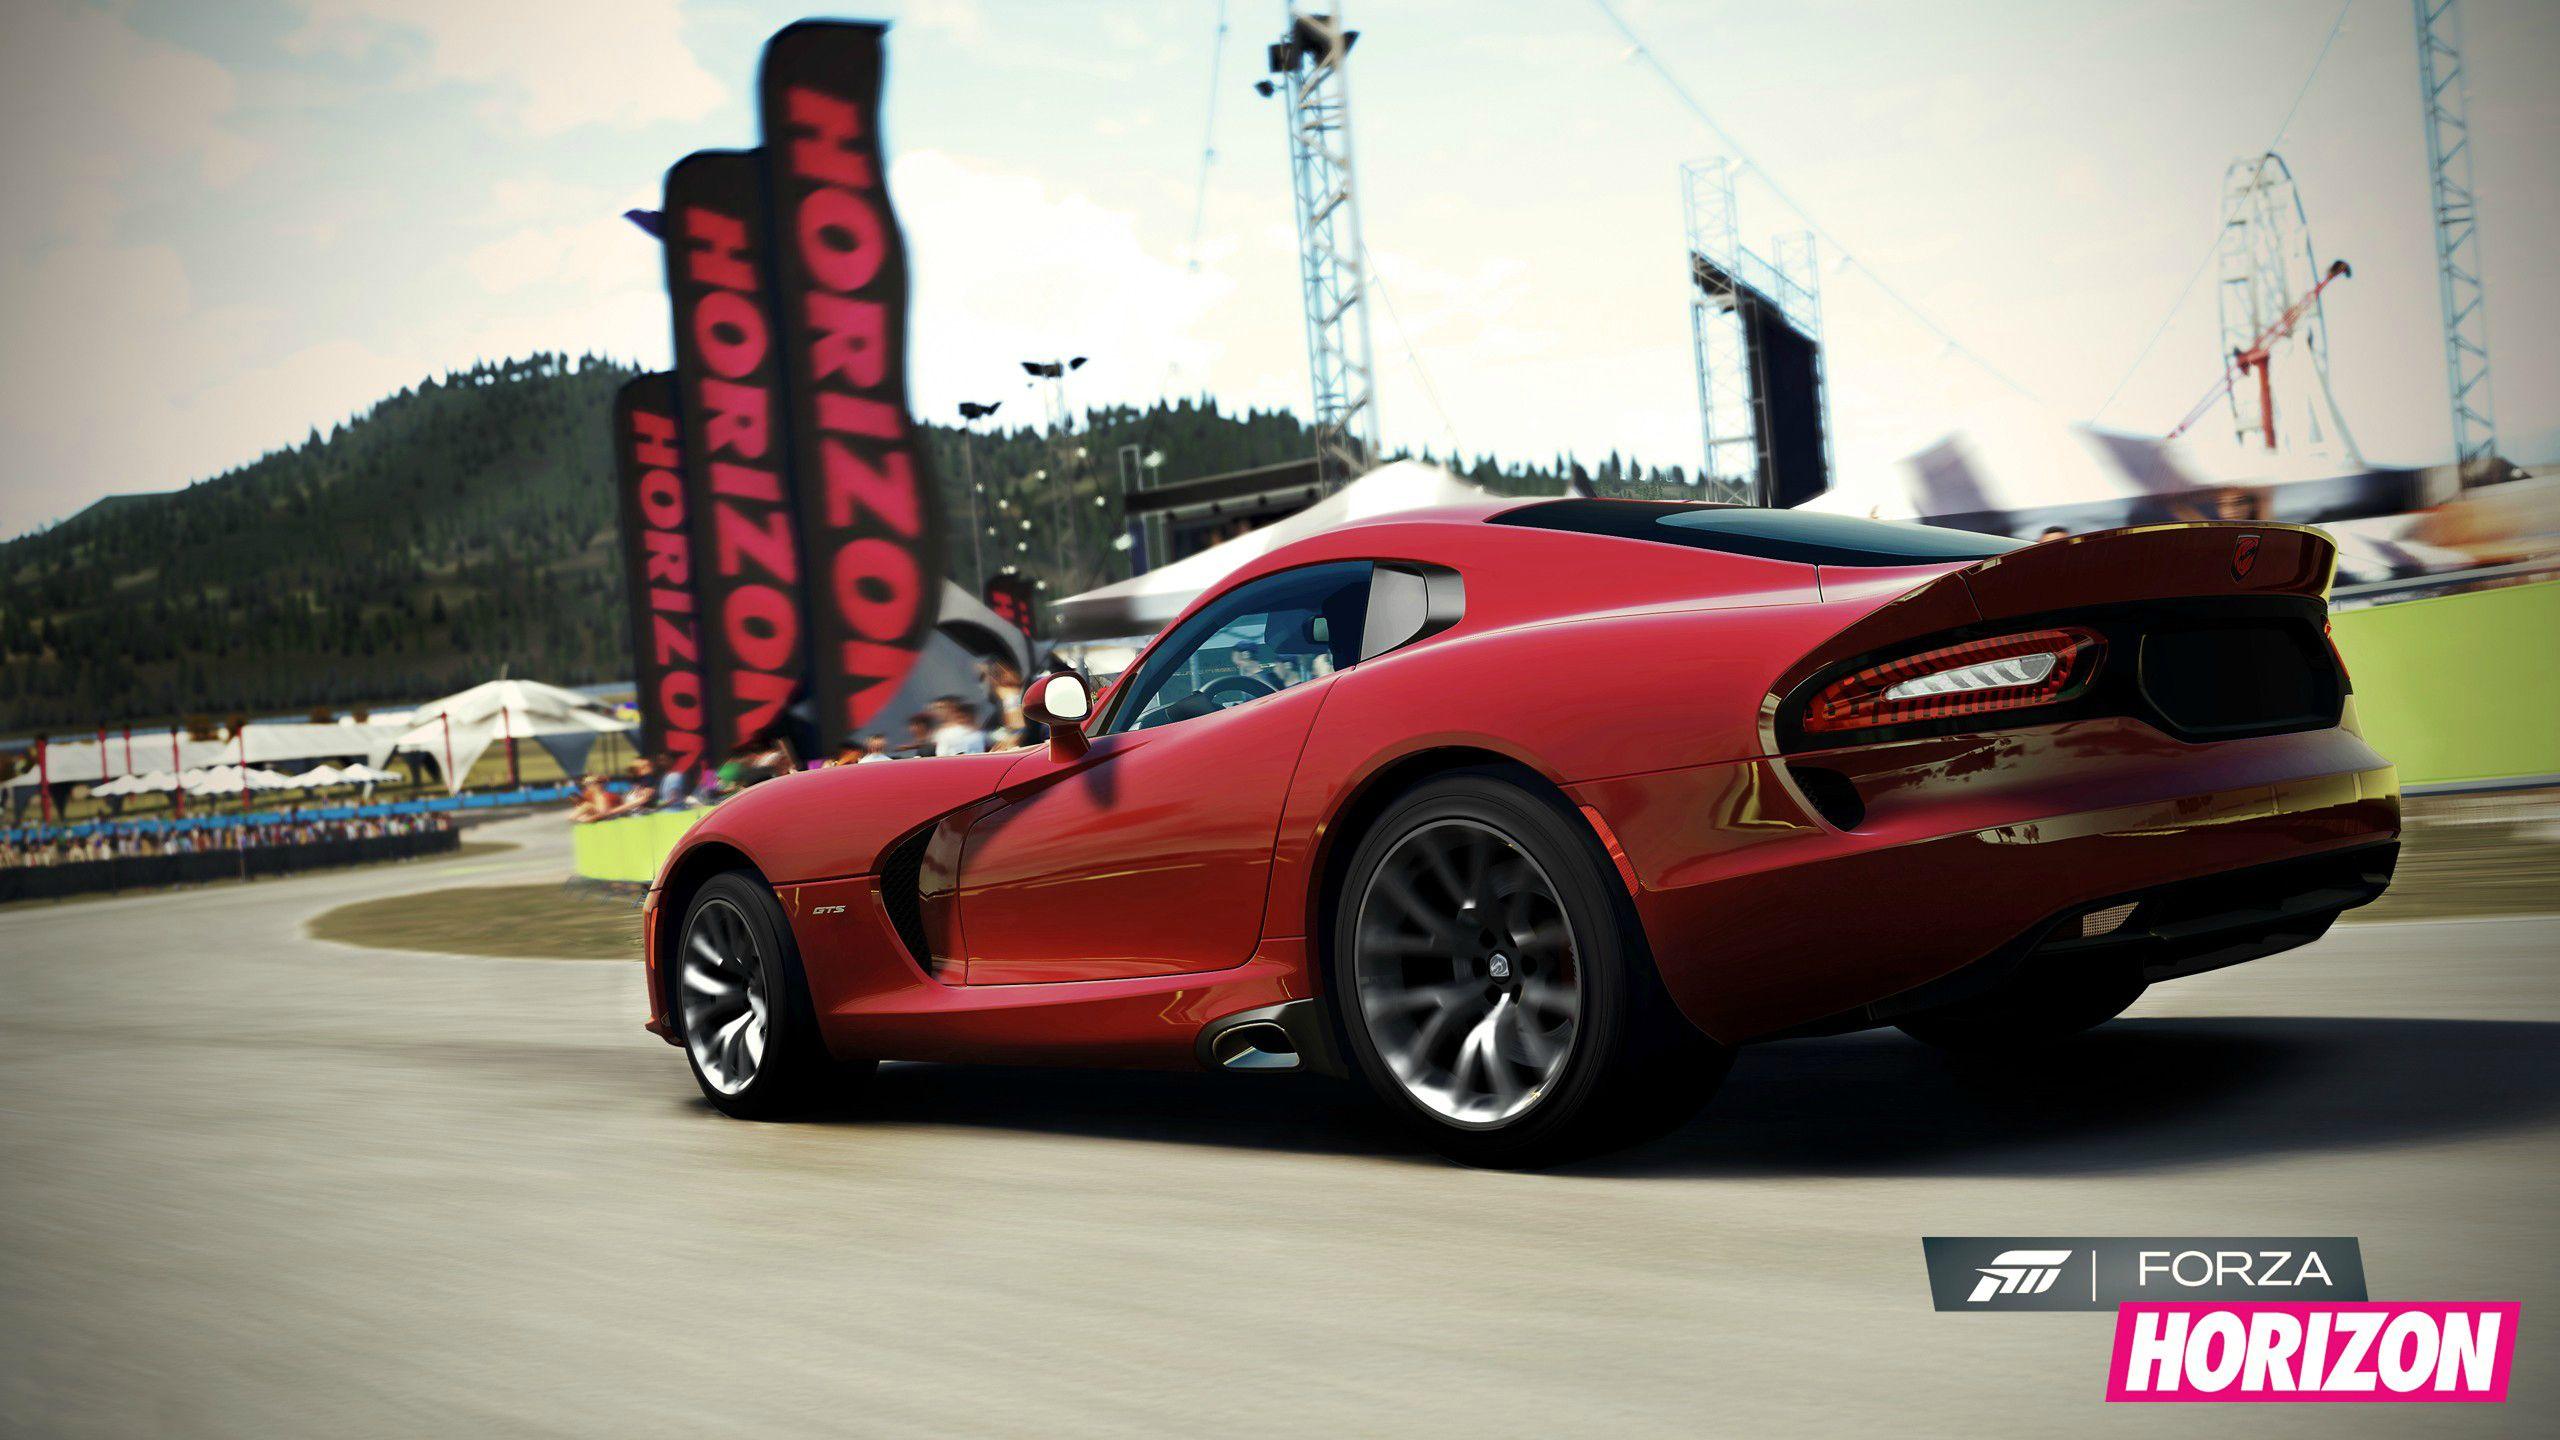 ForzaHorizon 360 Editeur 002